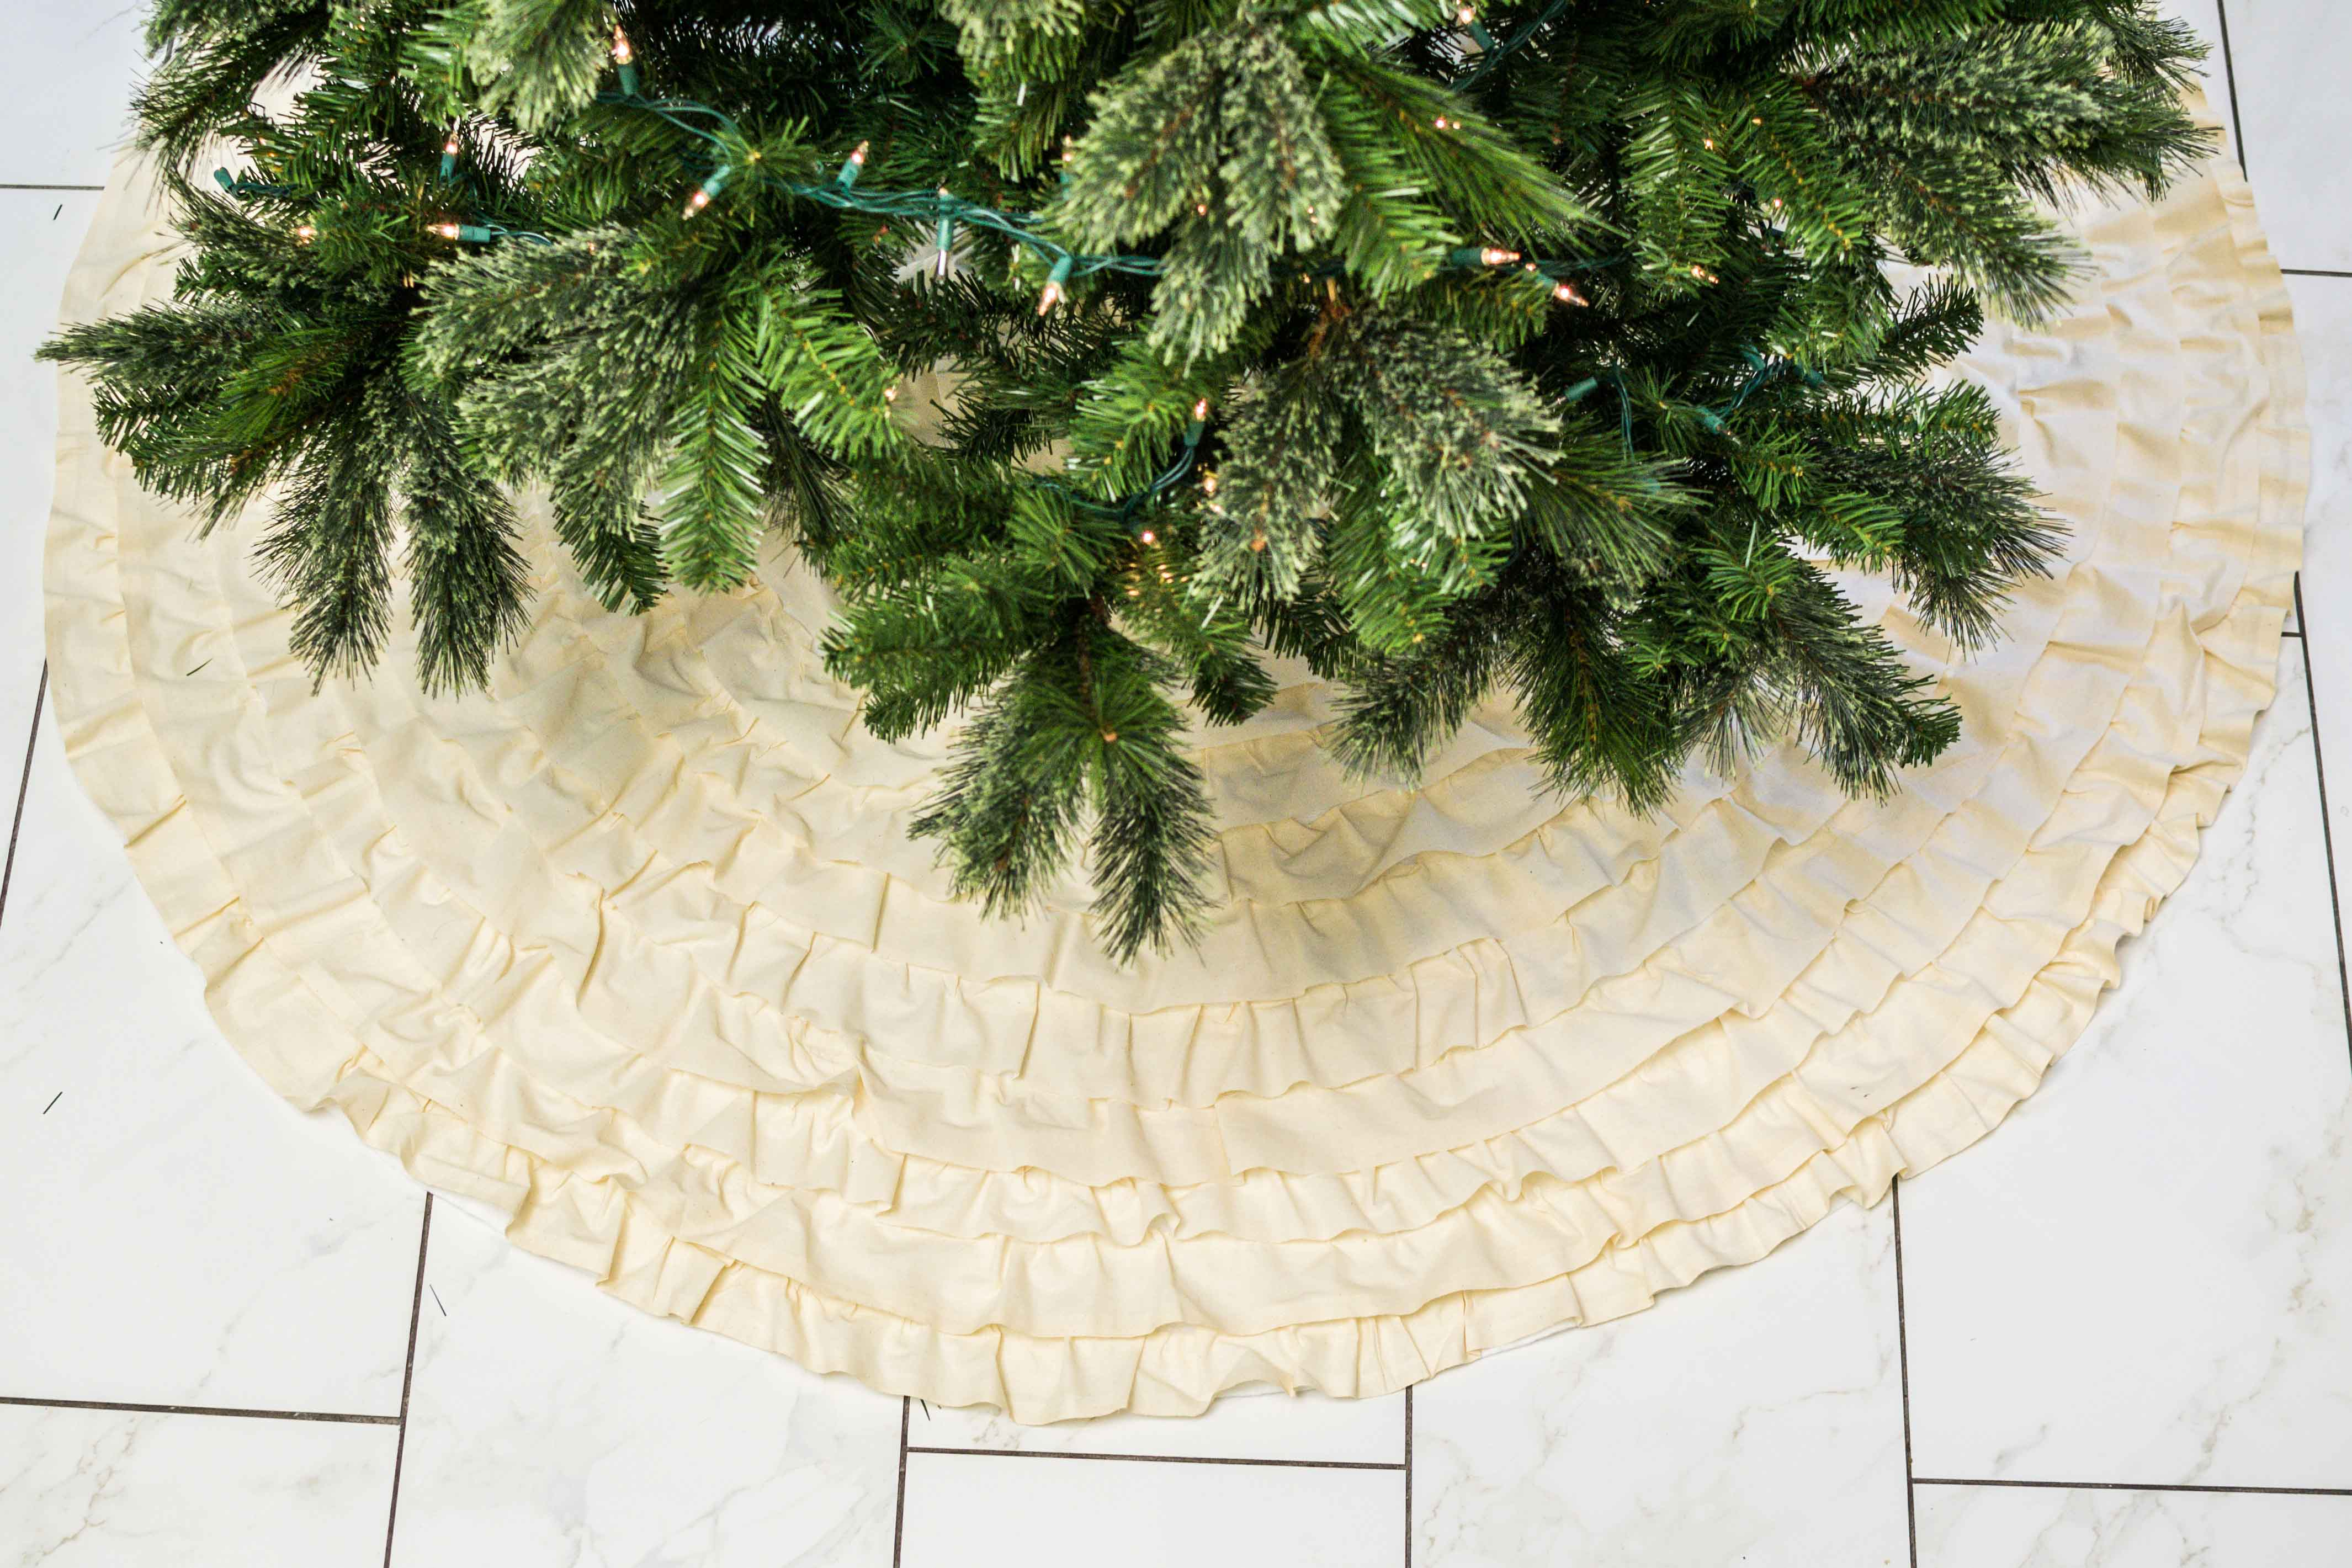 No-Sew Ruffled Christmas Tree Skirt (DIY Tutorial)